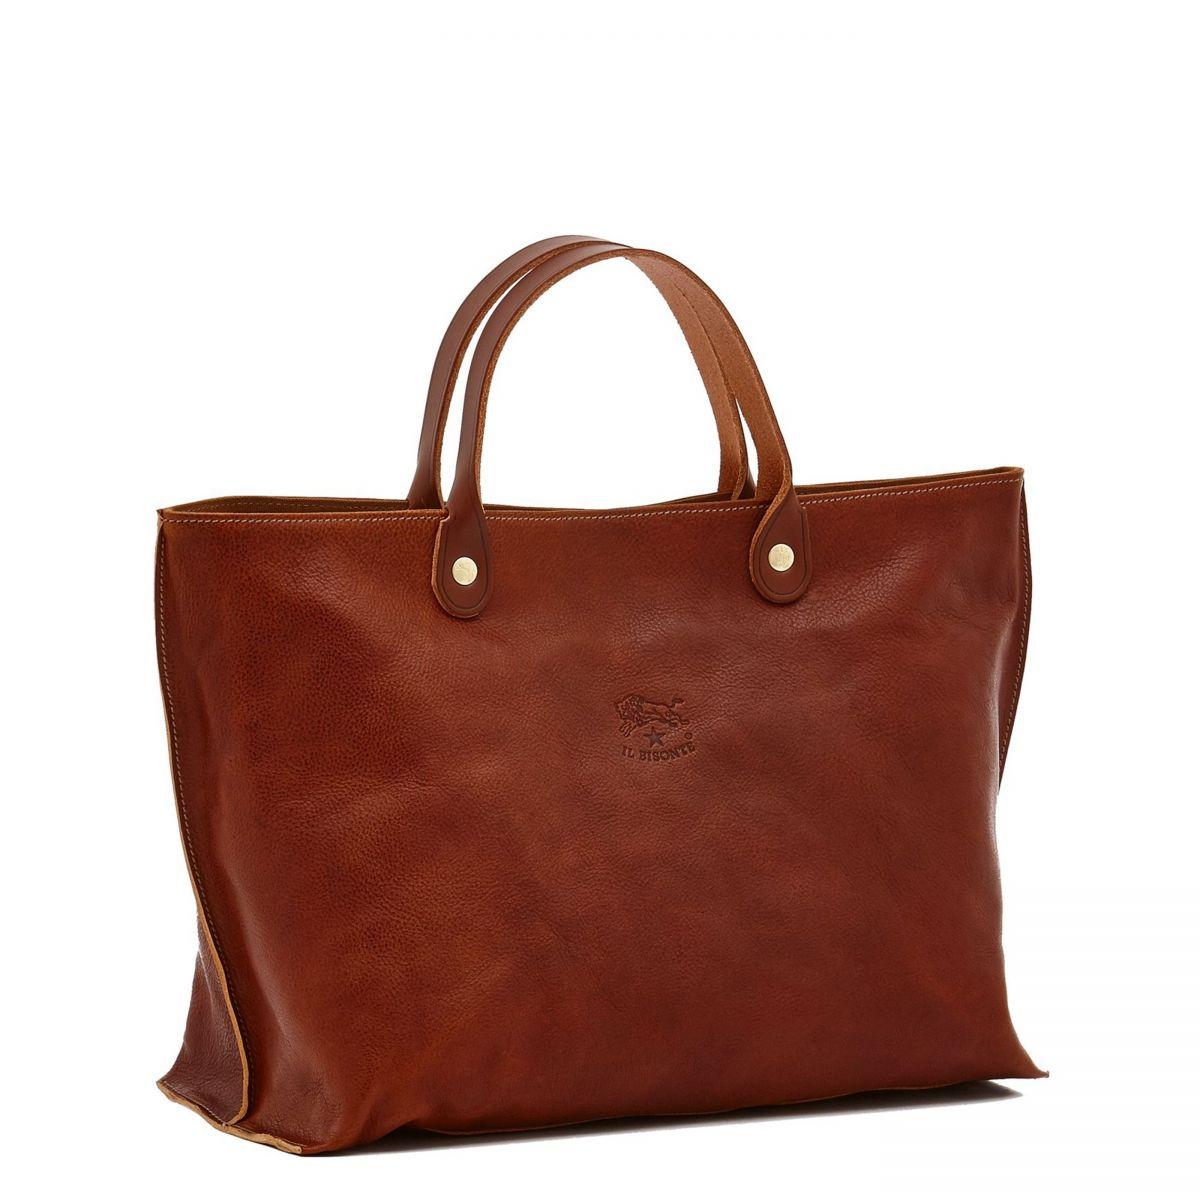 Women's Handbag in Vintage Cowhide Leather BTH022 color Dark Brown Seppia | Details